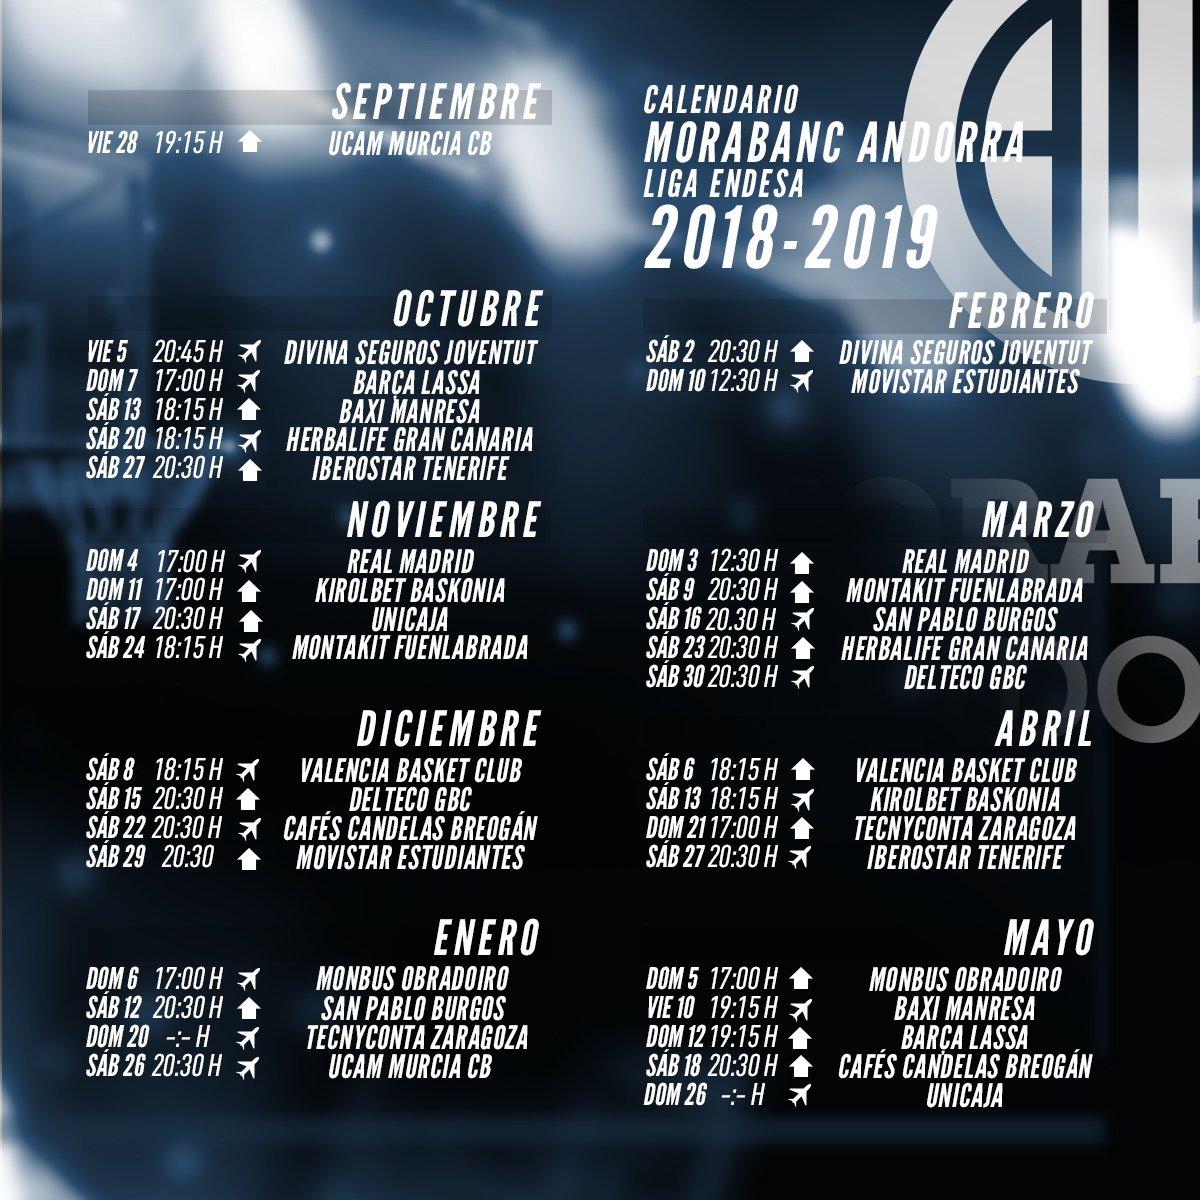 Calendario Unicaja.Liga Endesa On Twitter Calendario Completo Ligaendesa 2018 19